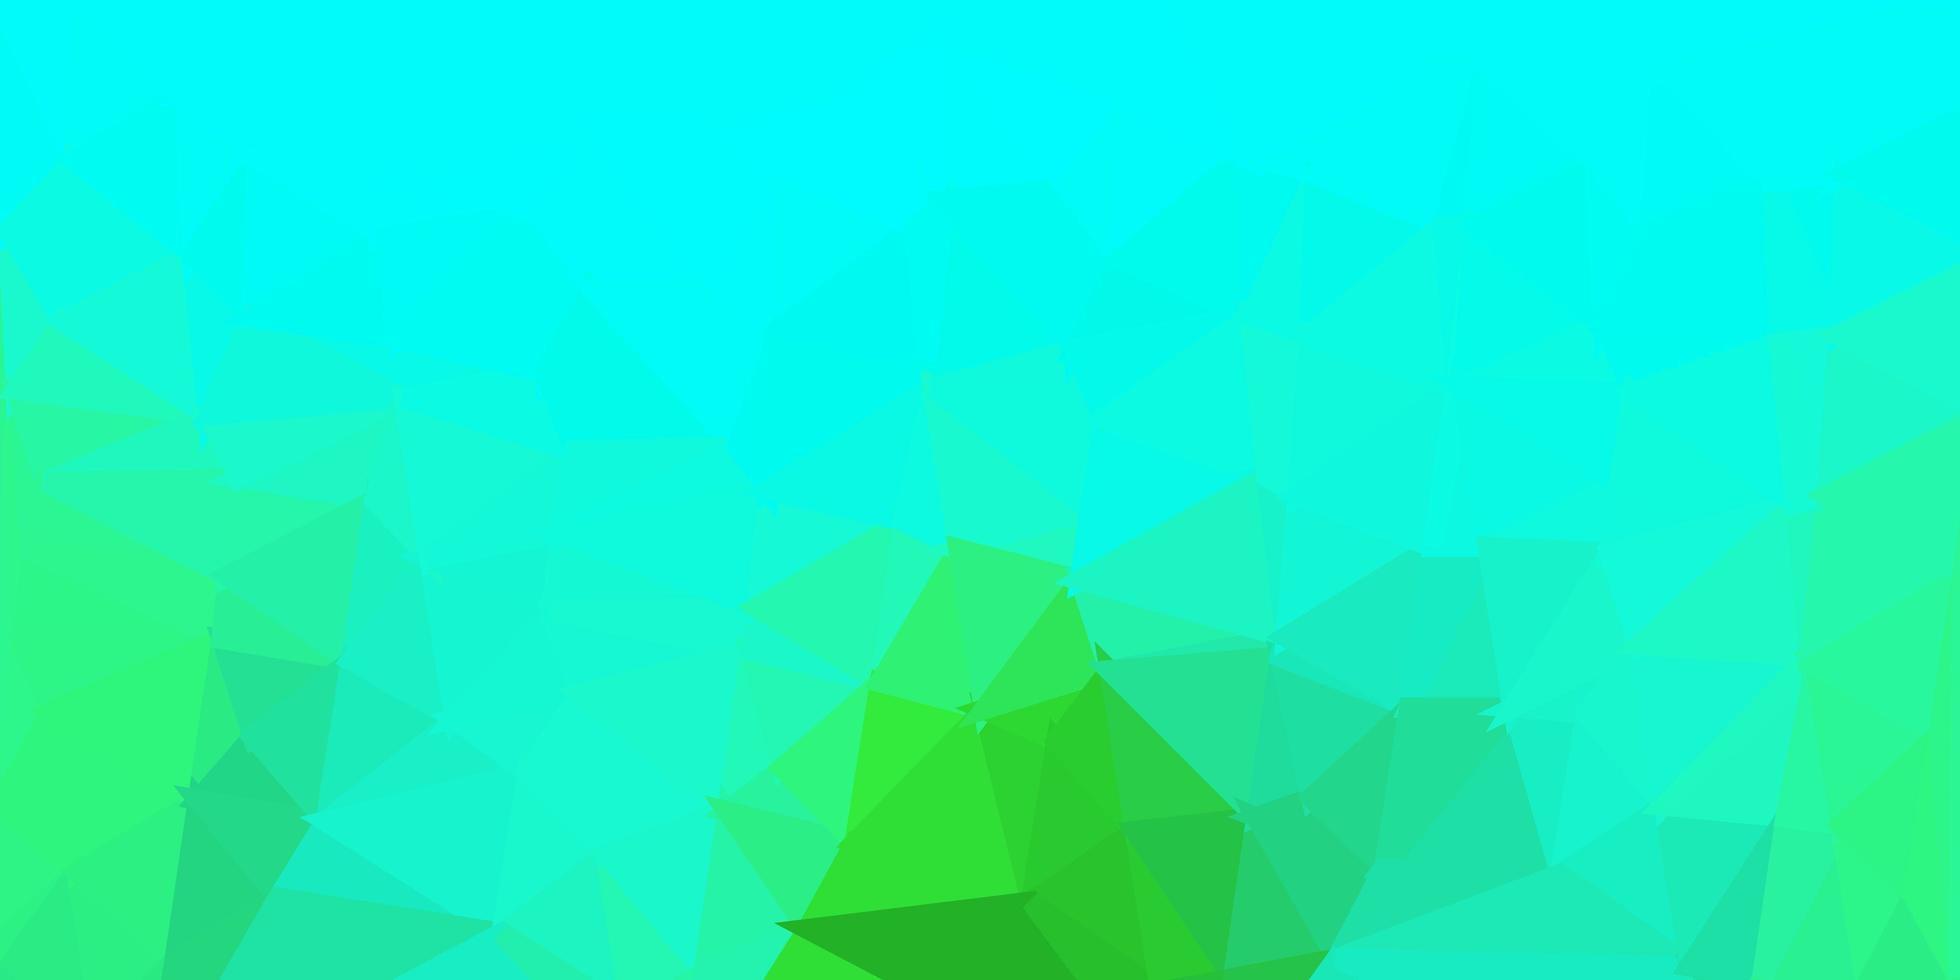 projeto poligonal geométrico do vetor verde claro.